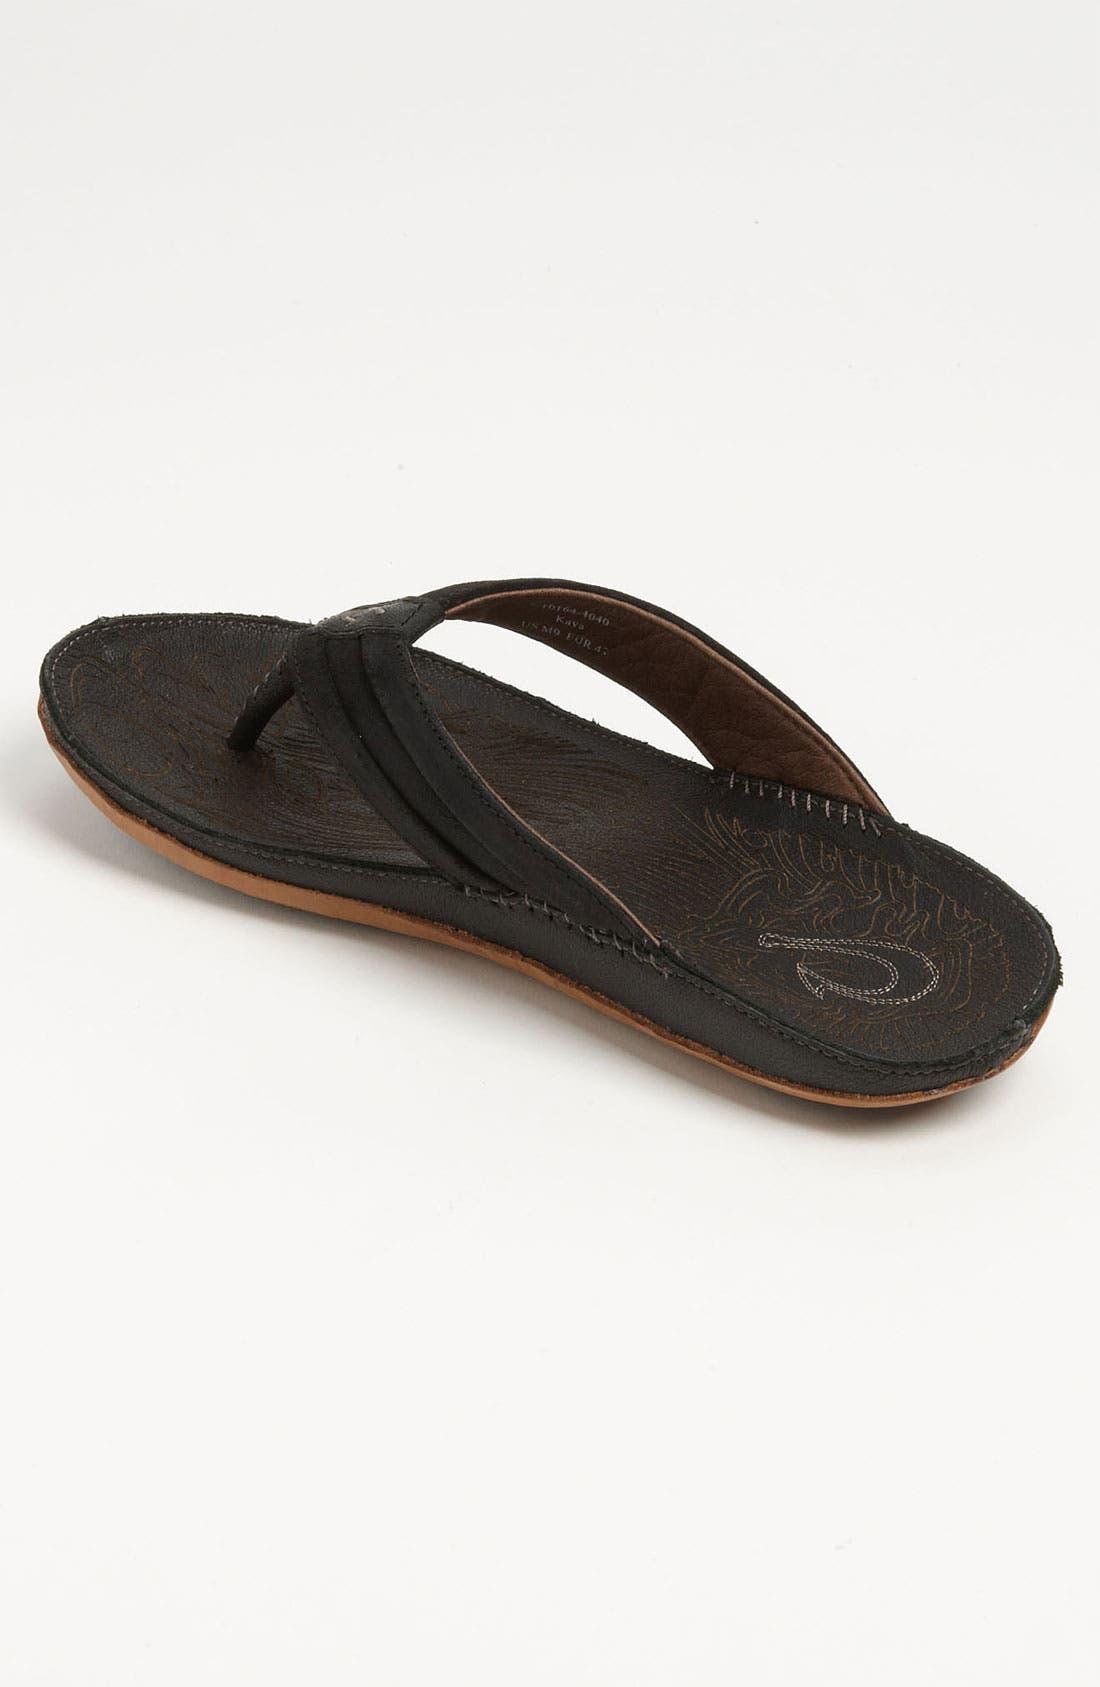 Alternate Image 2  - OluKai 'Kava' Flip Flop (Men)